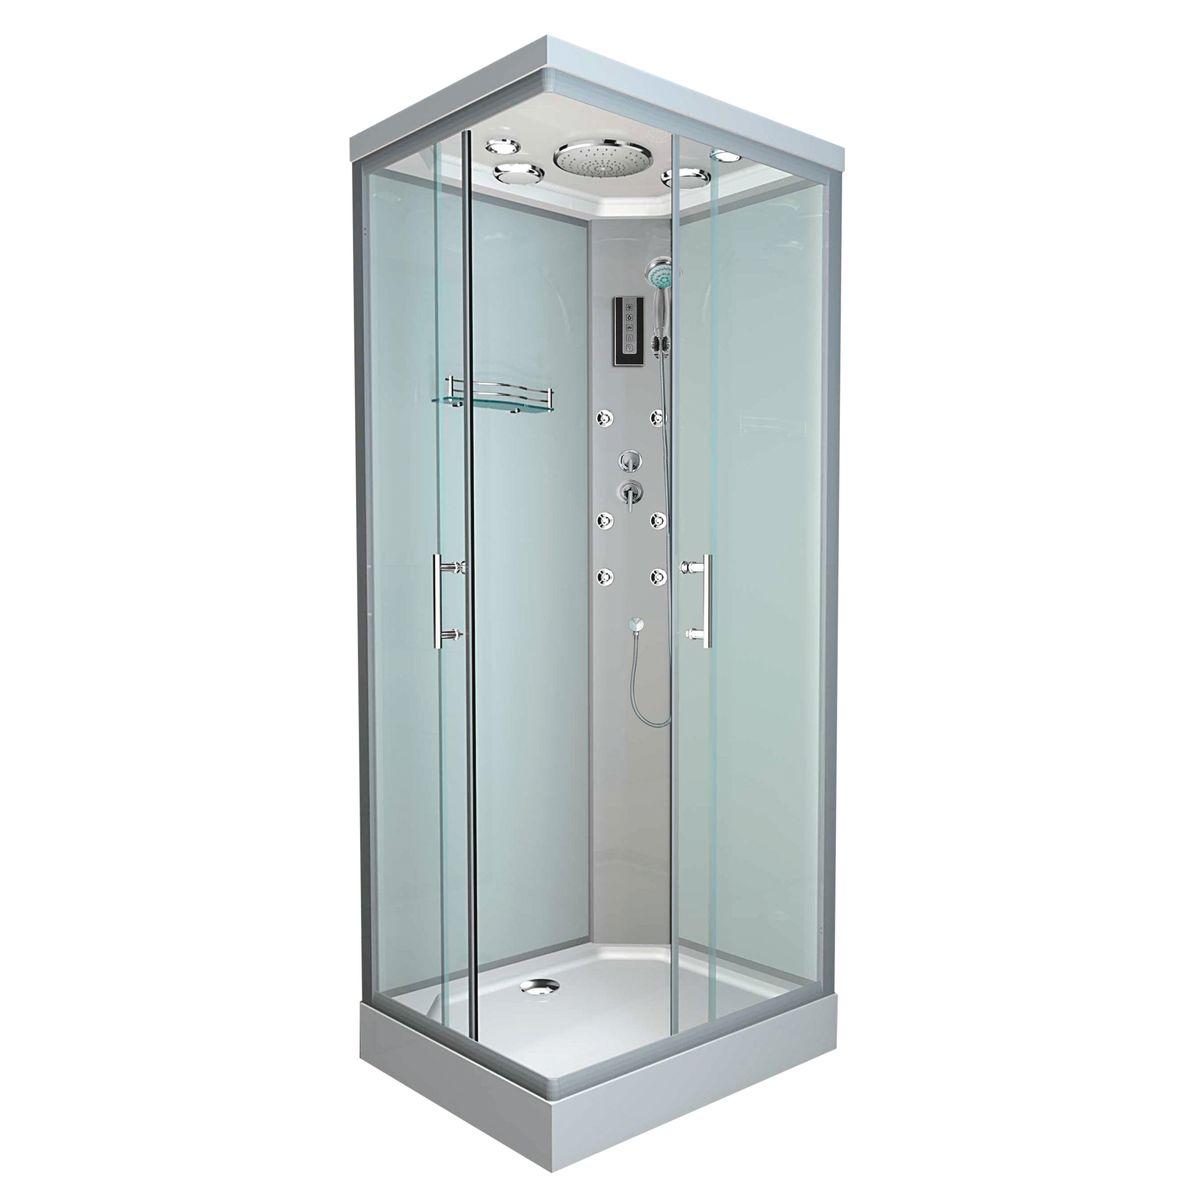 Moda vasca idromassaggio esterno leroy merlin oh24 pineglen - Cabine doccia prezzi leroy merlin ...